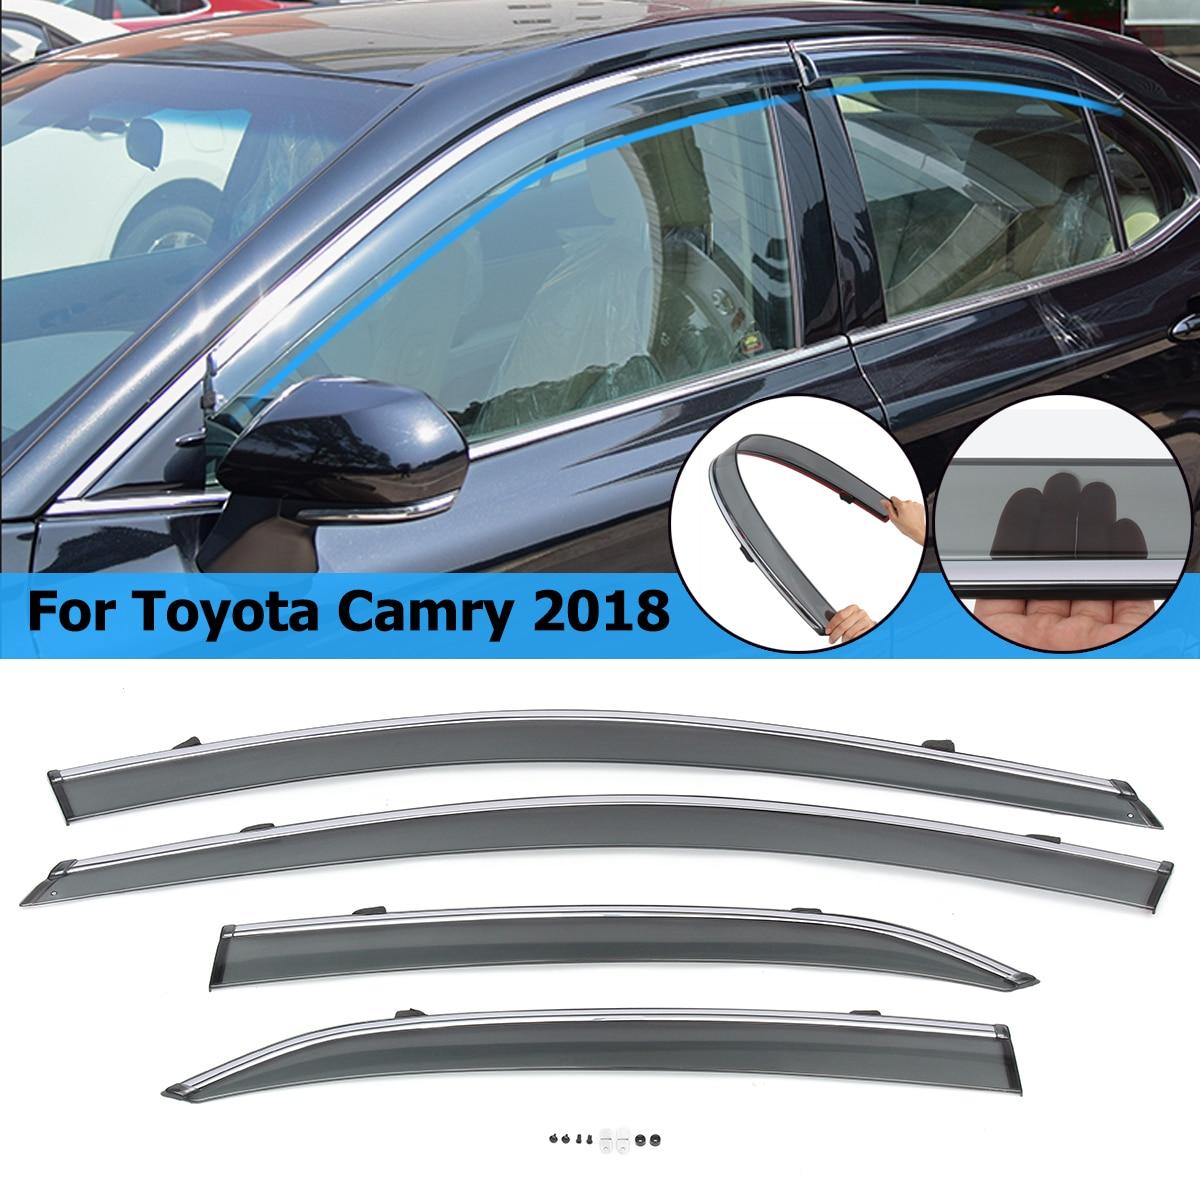 цена на 4pcs Car Styling Front & Rear Sun Window Visors Chrome Trim For Toyota Camry 2018 Smoke